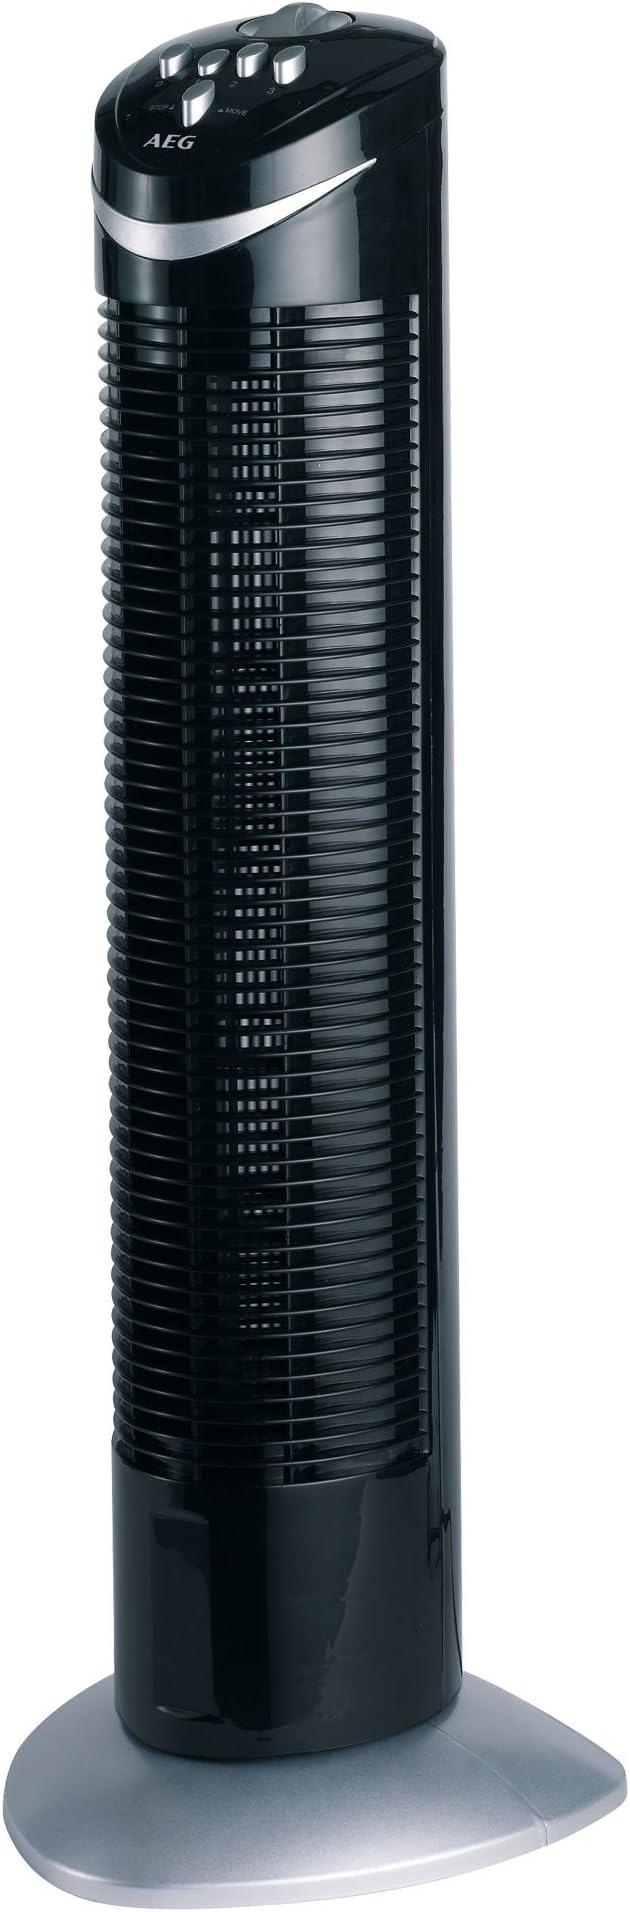 AEG T-VL 5531 - Ventilador de torre, 3 velocidades, temporizador ...